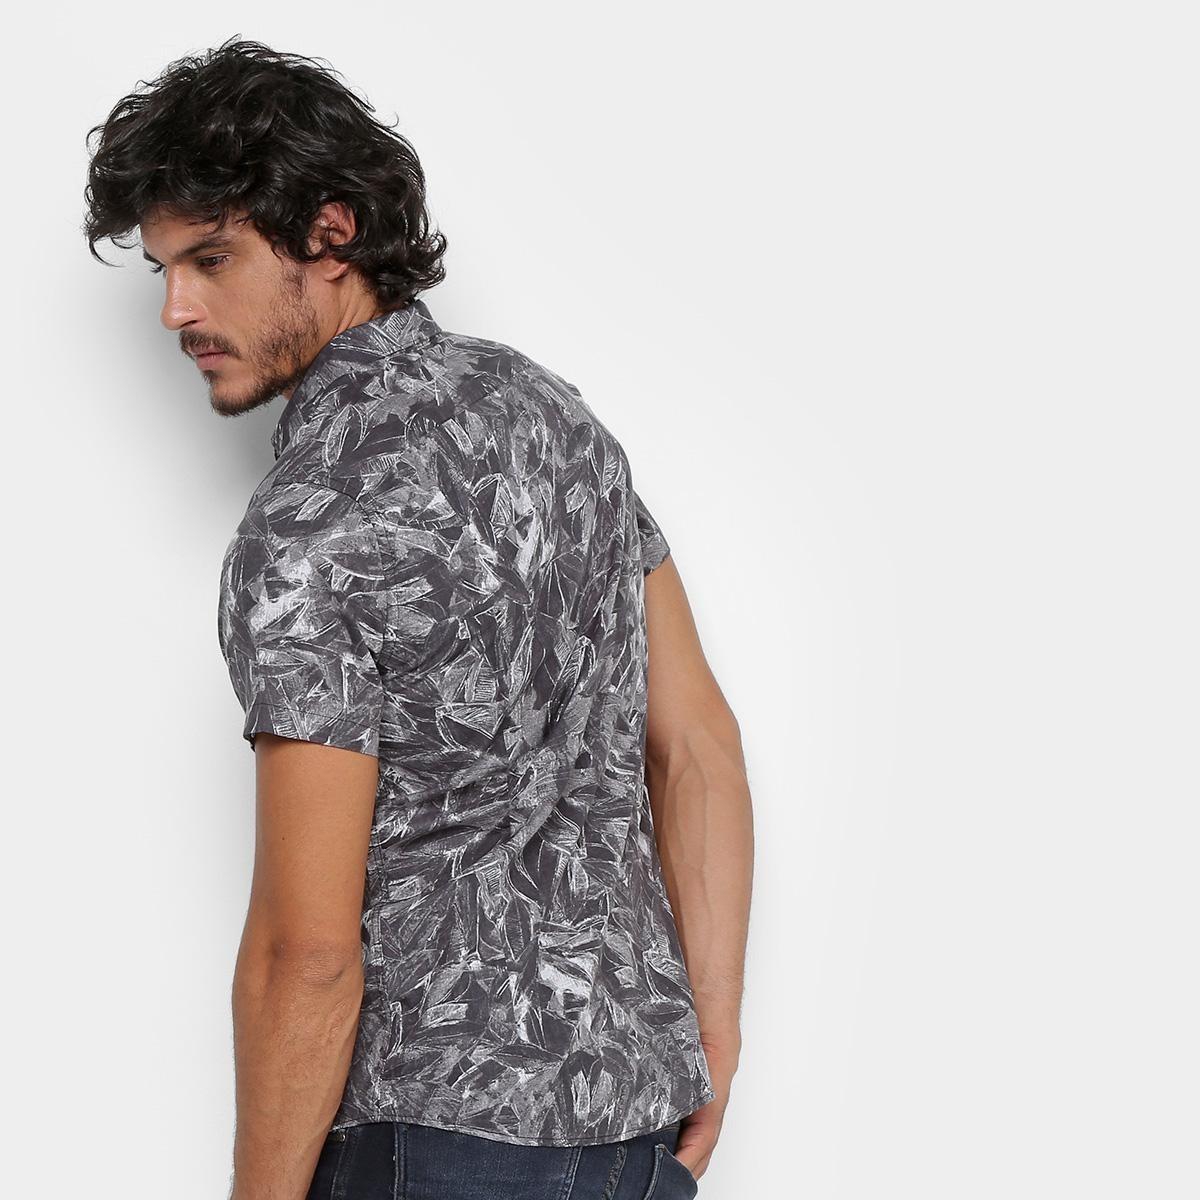 27ded366be95c Camisa Acostamento Manga Curta Estampada Masculina - R  249